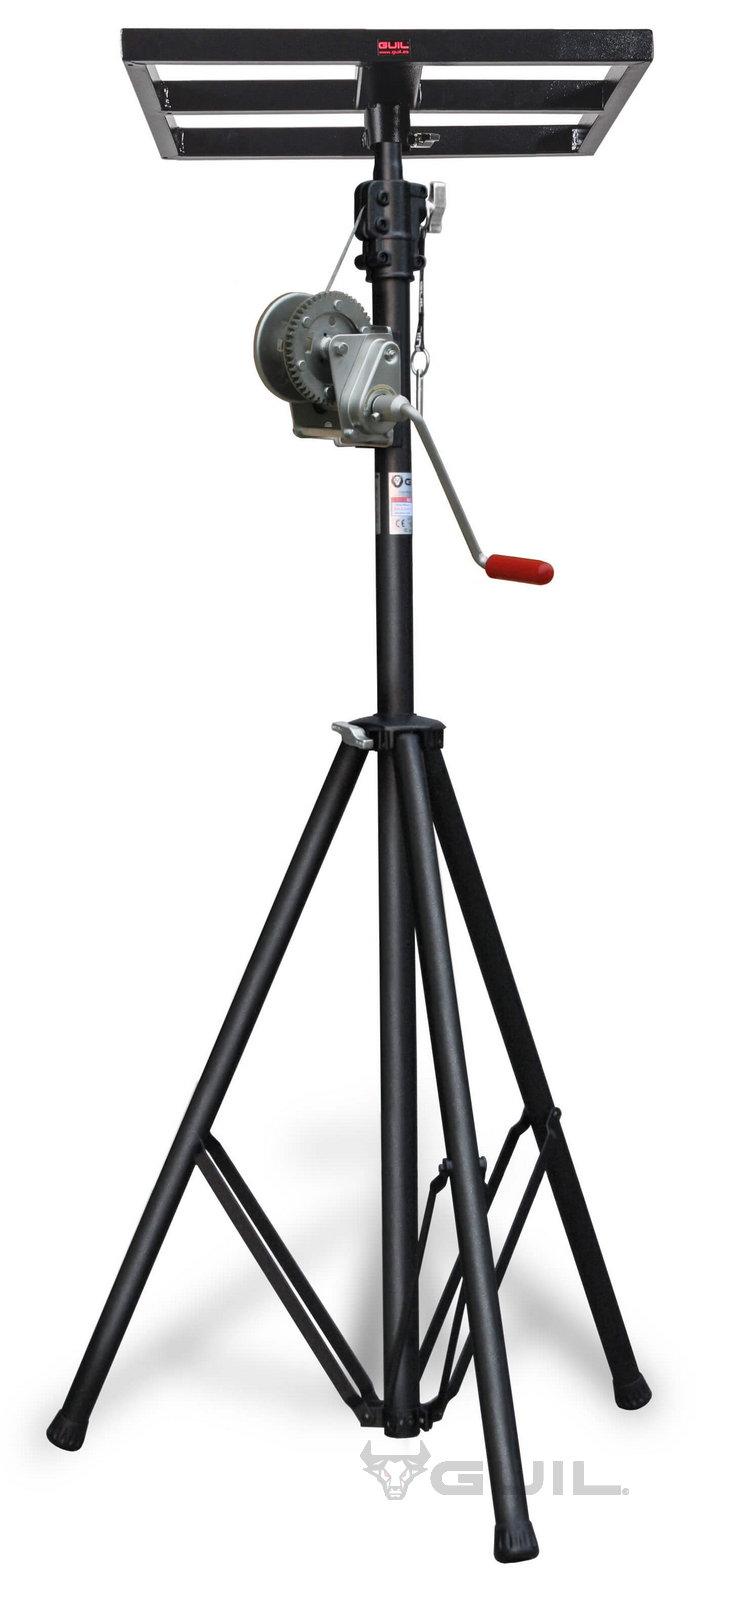 Materiaallift 1,7-3,3 m 85 kg (dutch) (4)